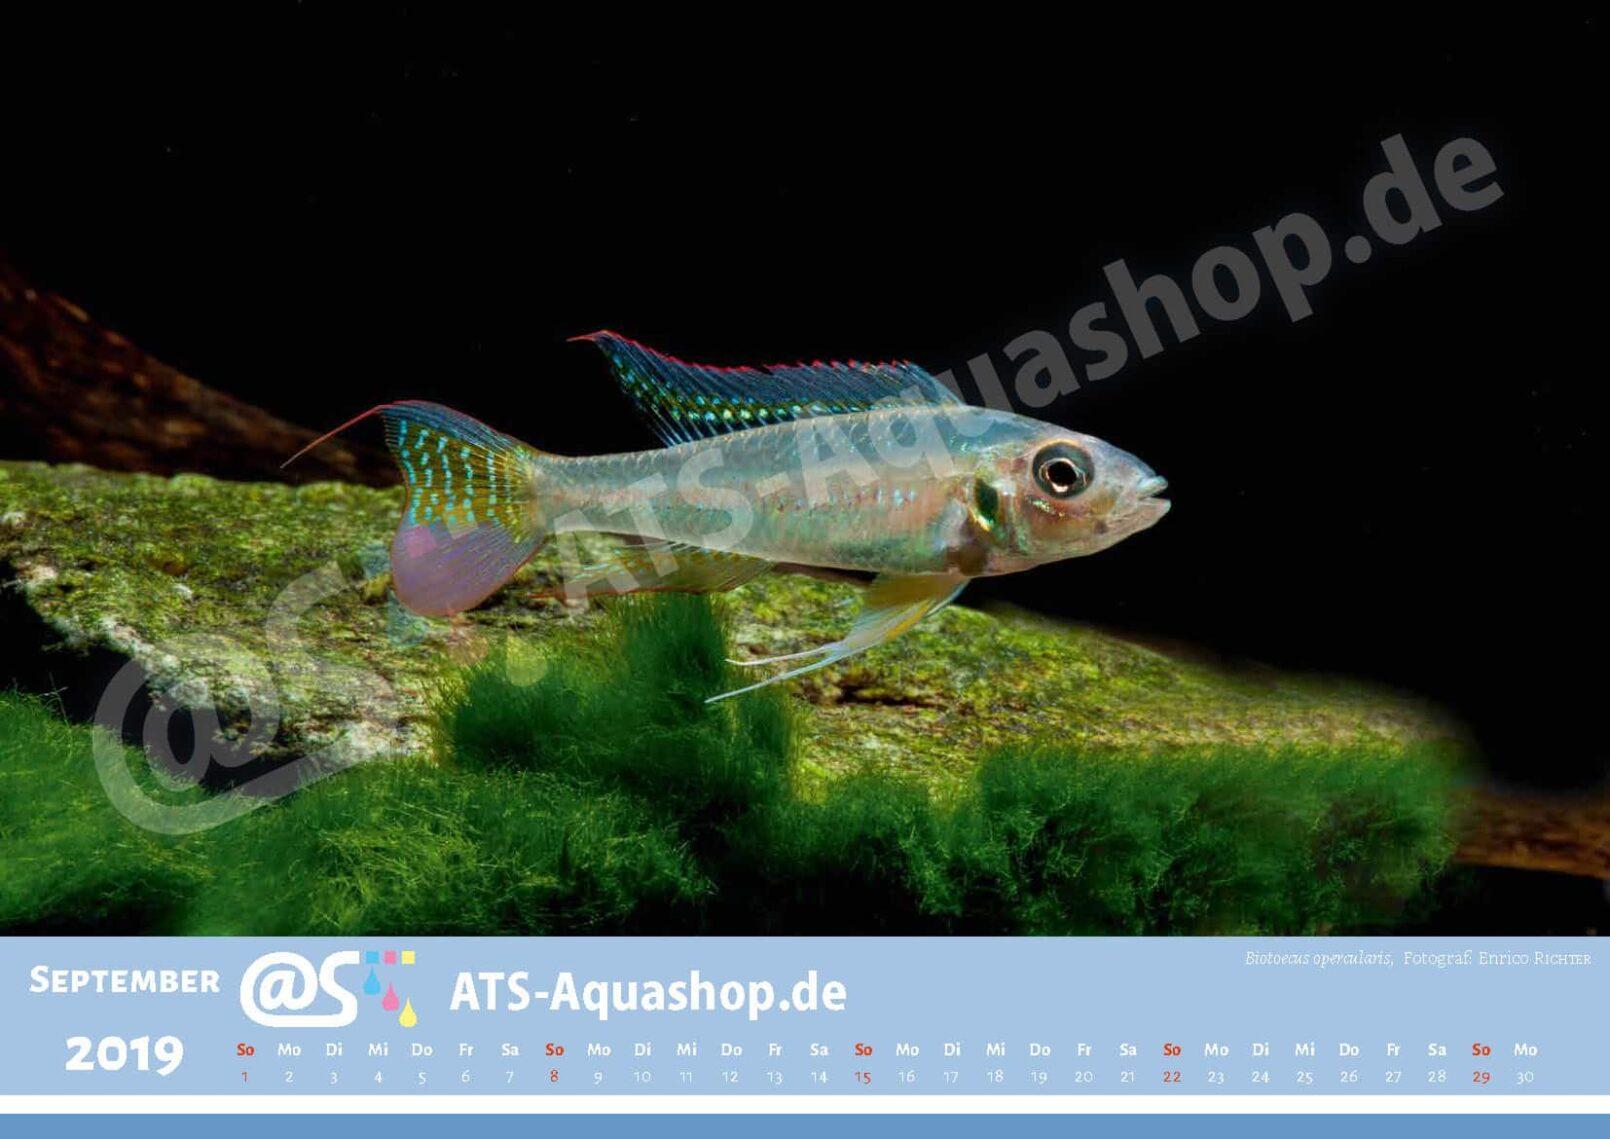 Foto Jahreskalender 2019 DIN A3: Biotoecus opercularis